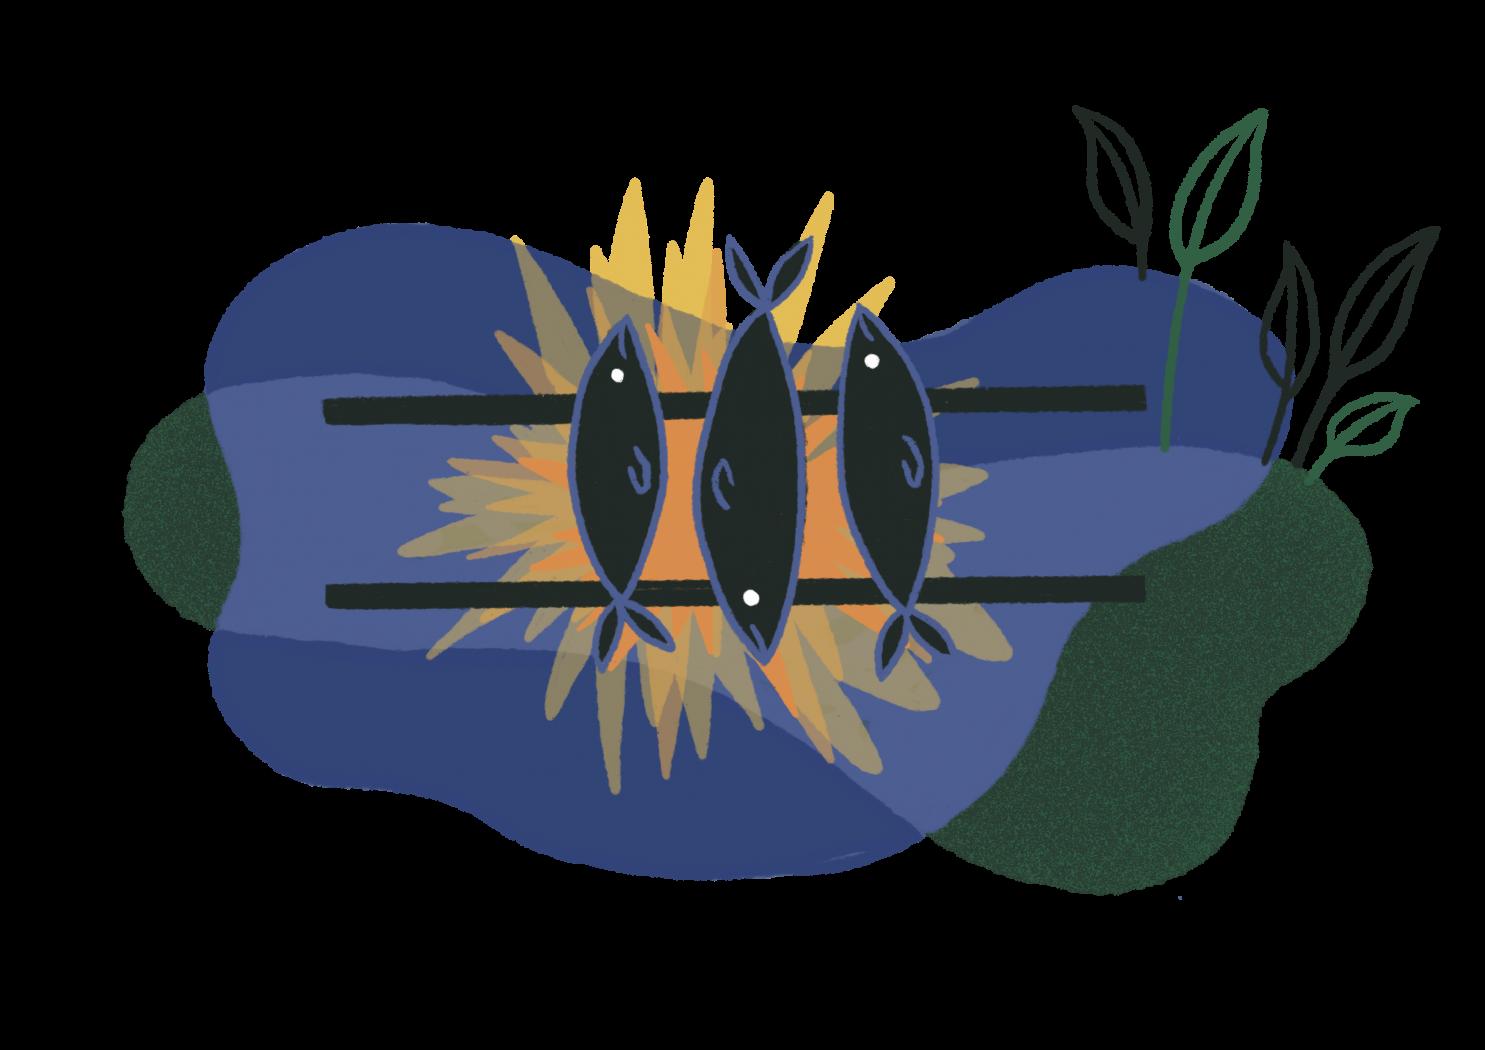 Char-grilling fish